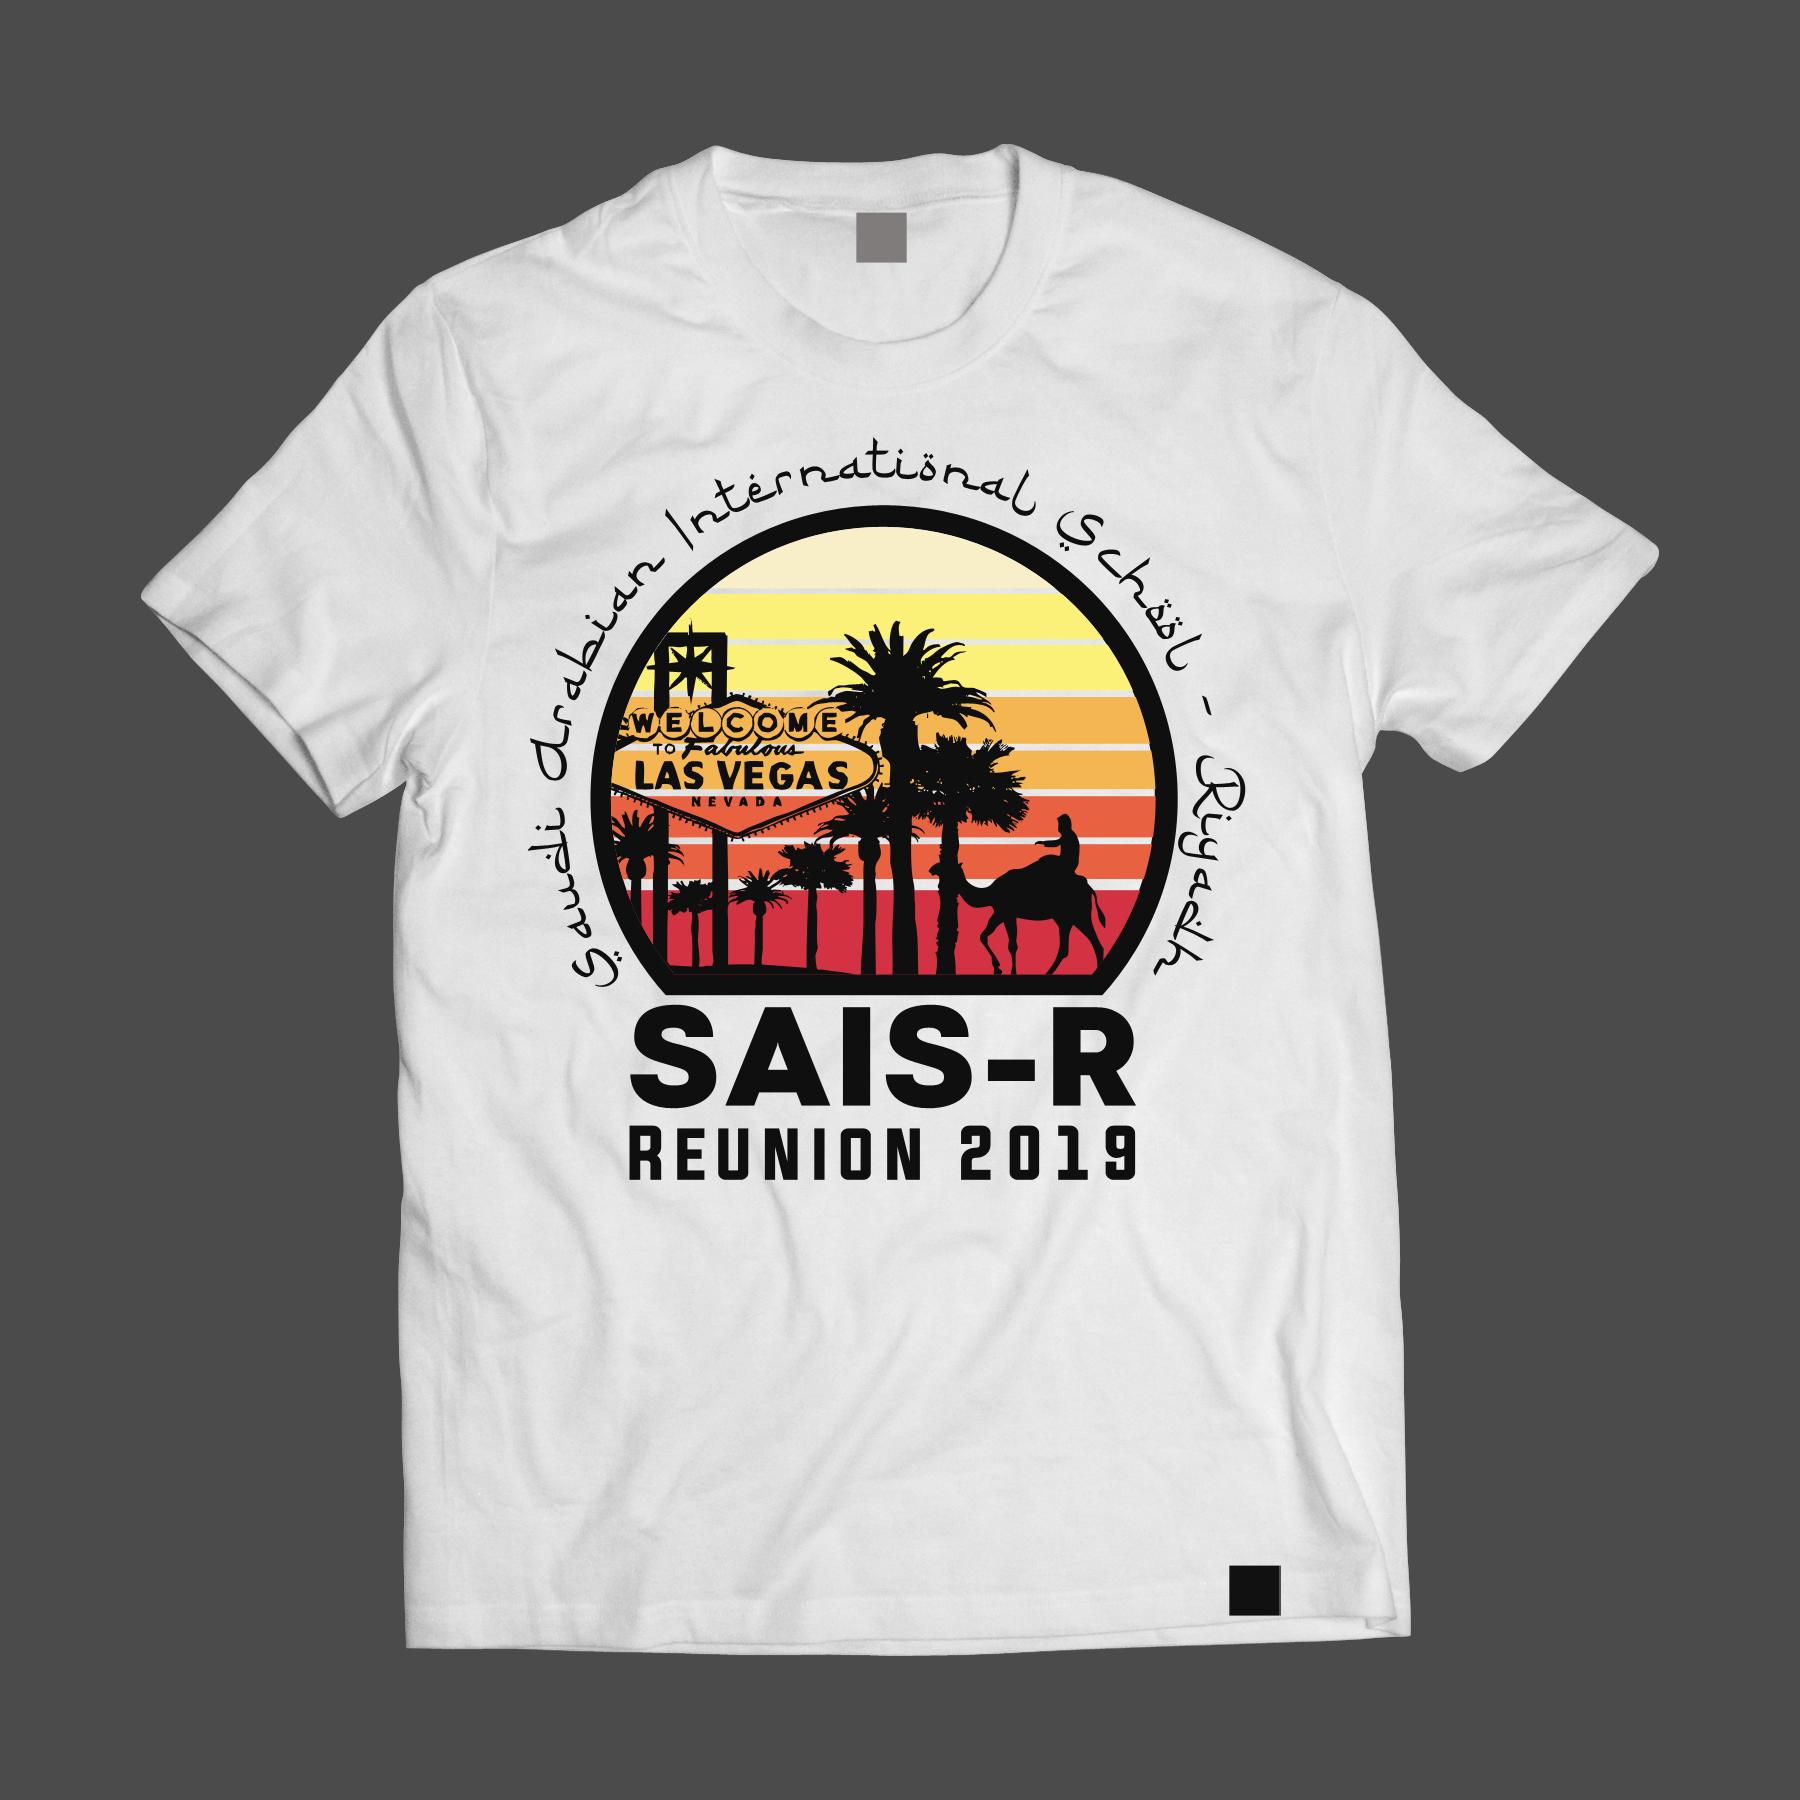 High School Reunion in Las Vegas needs a memorable T-Shirt!